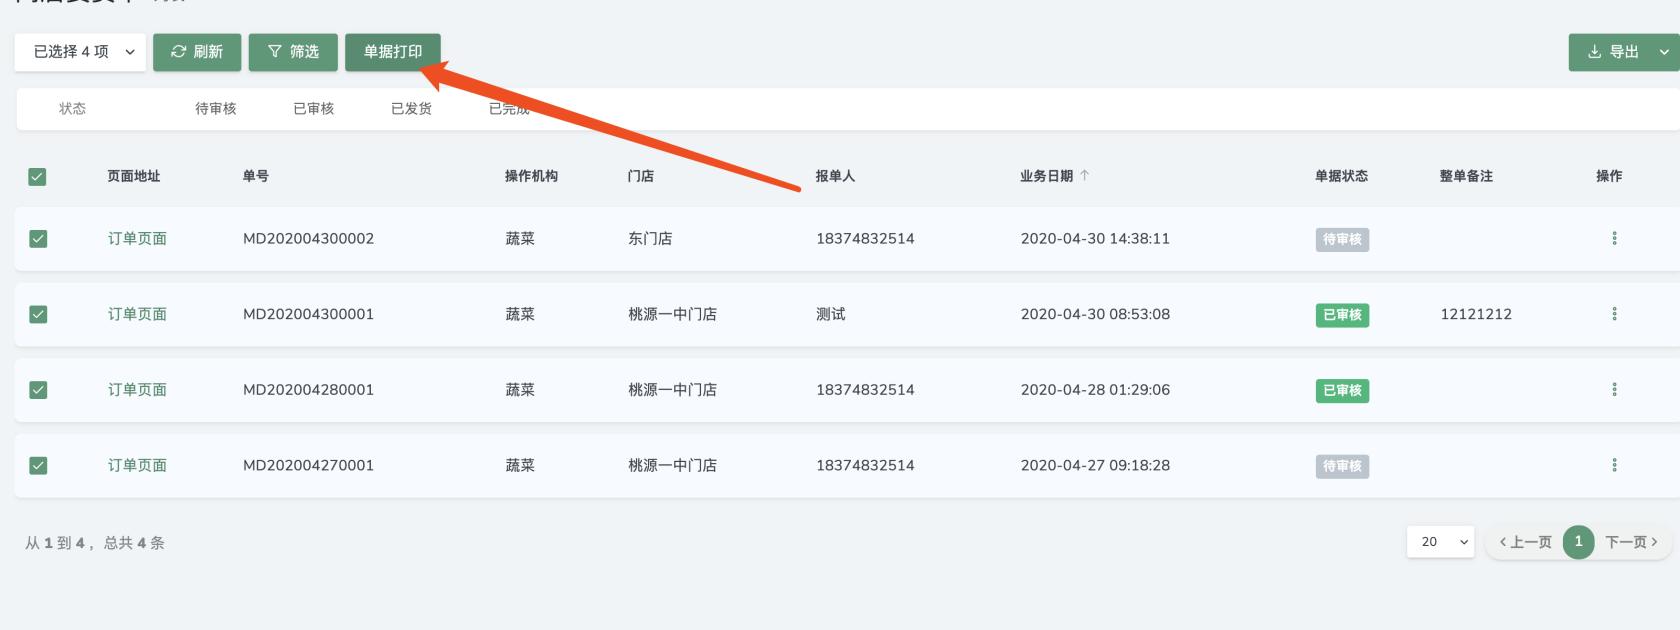 dcat-admin开源框架在erp项目中的应用